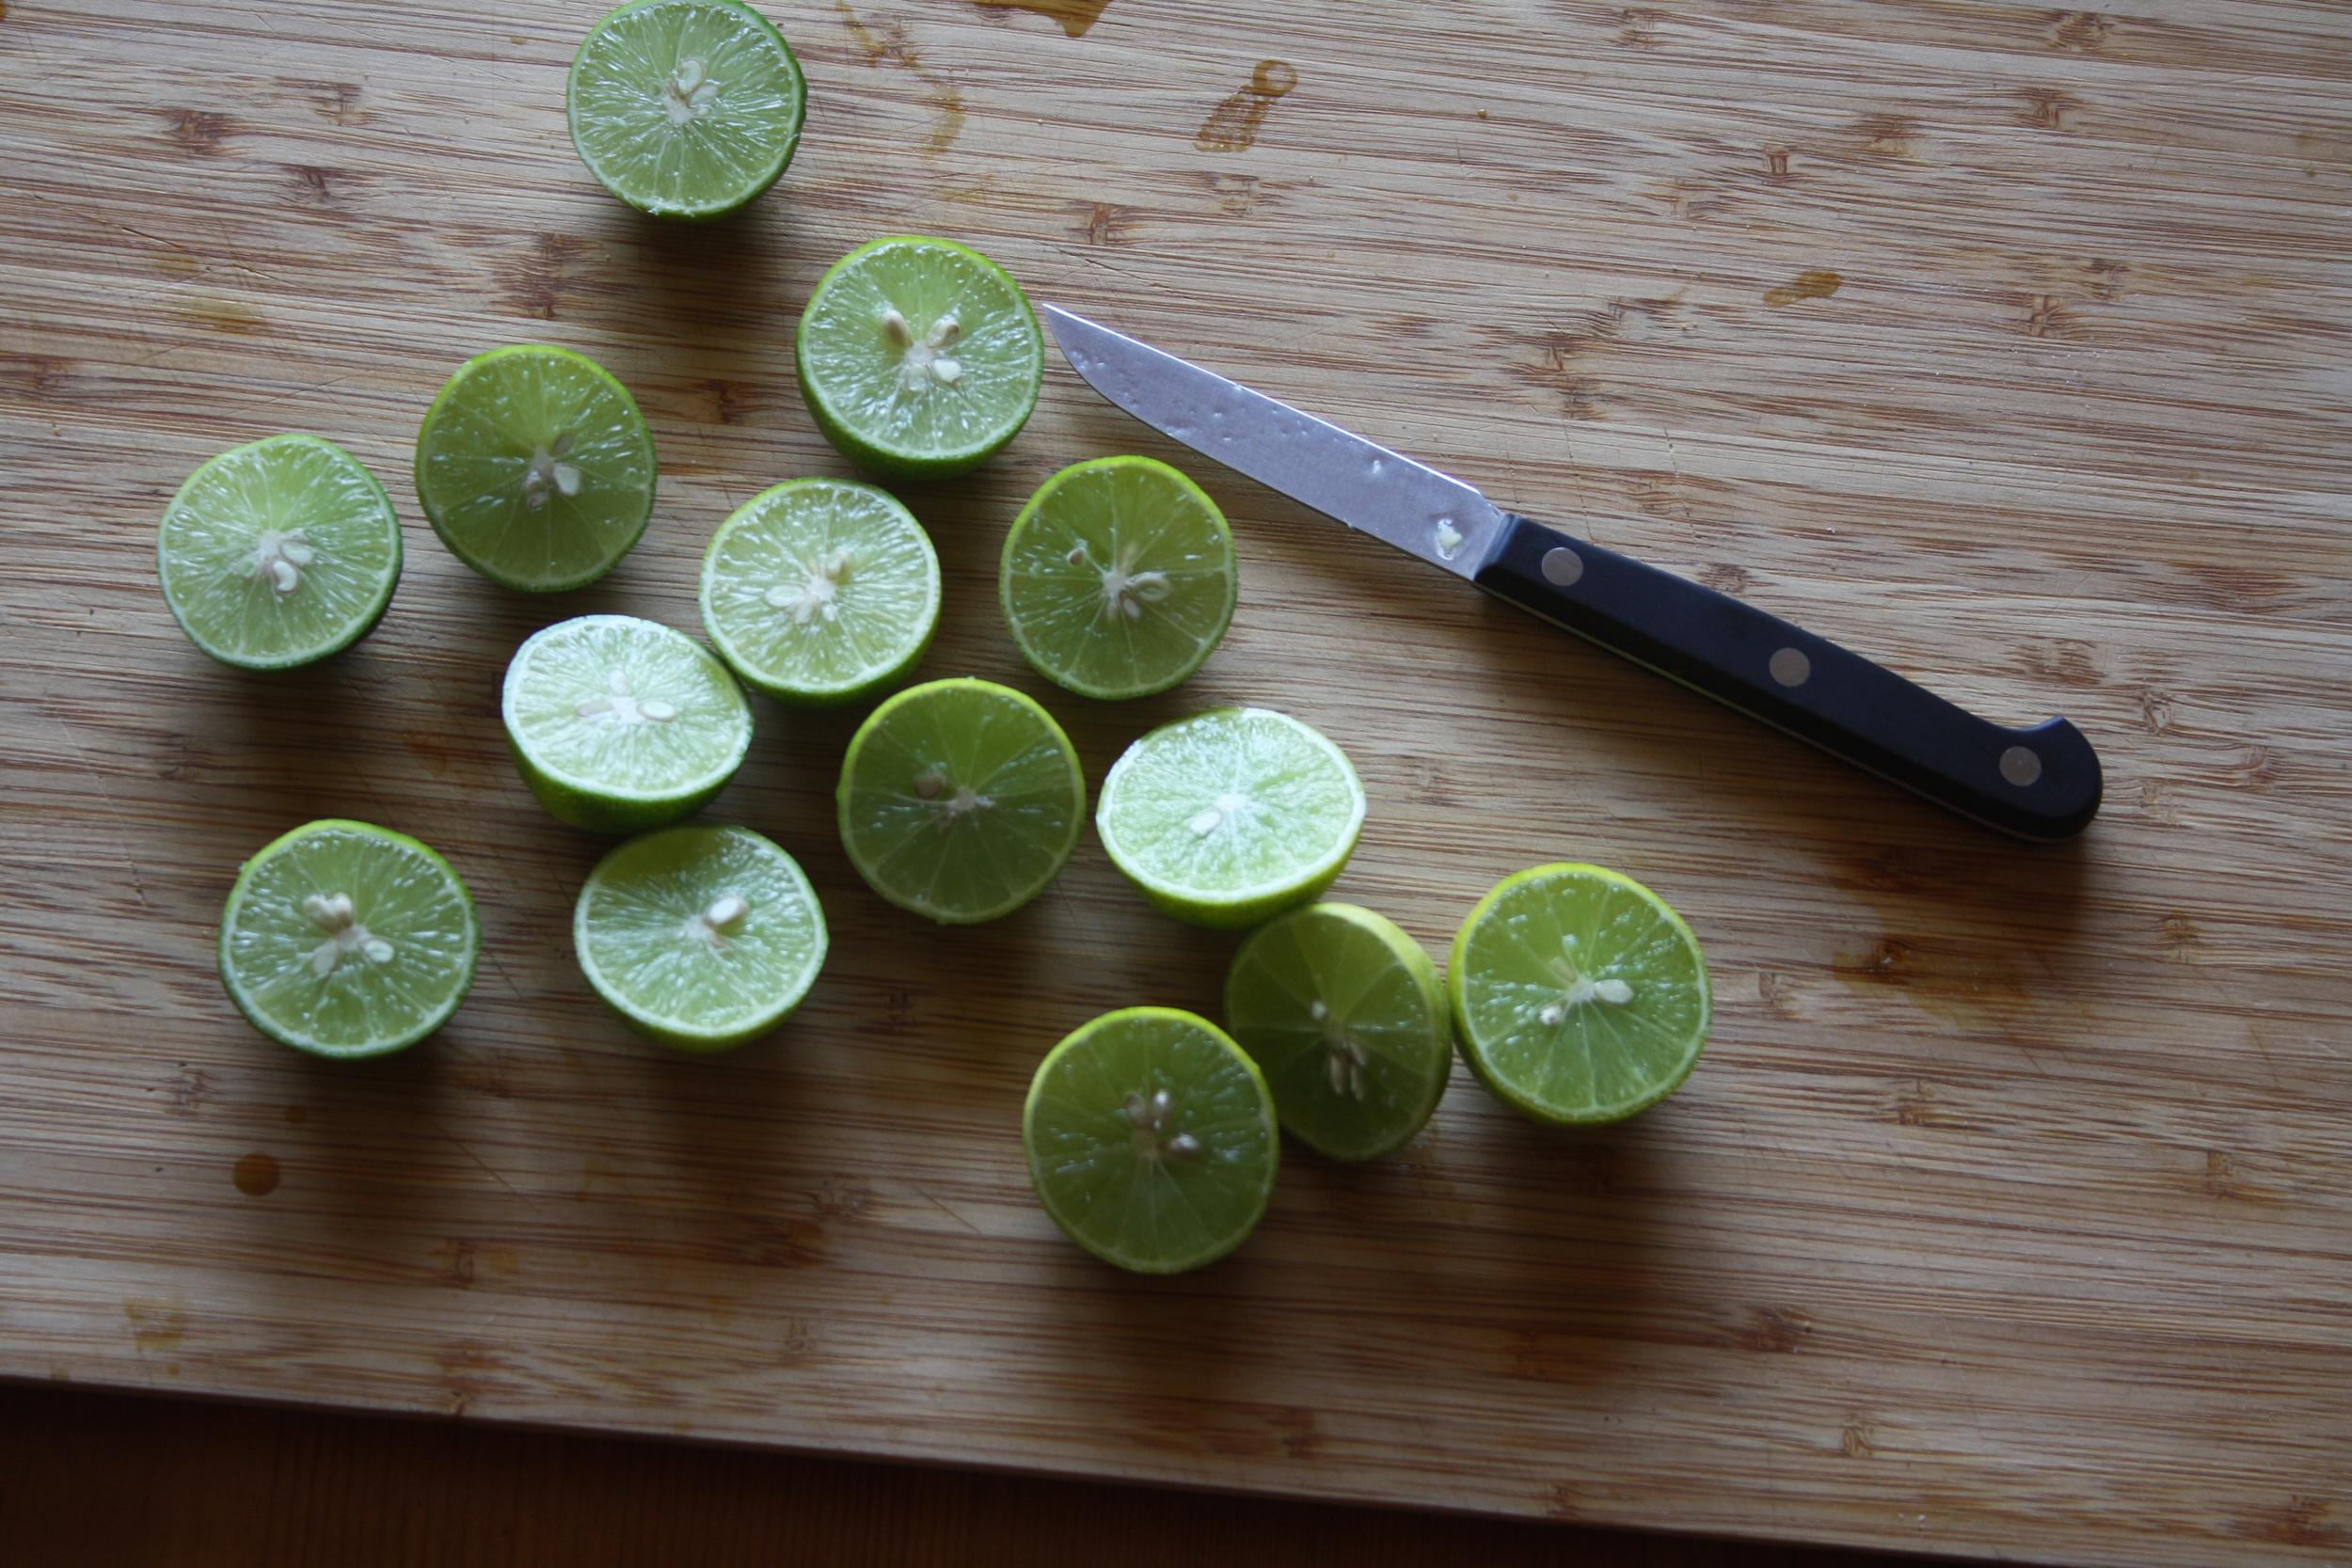 Key Limes sliced on a wooden cutting board